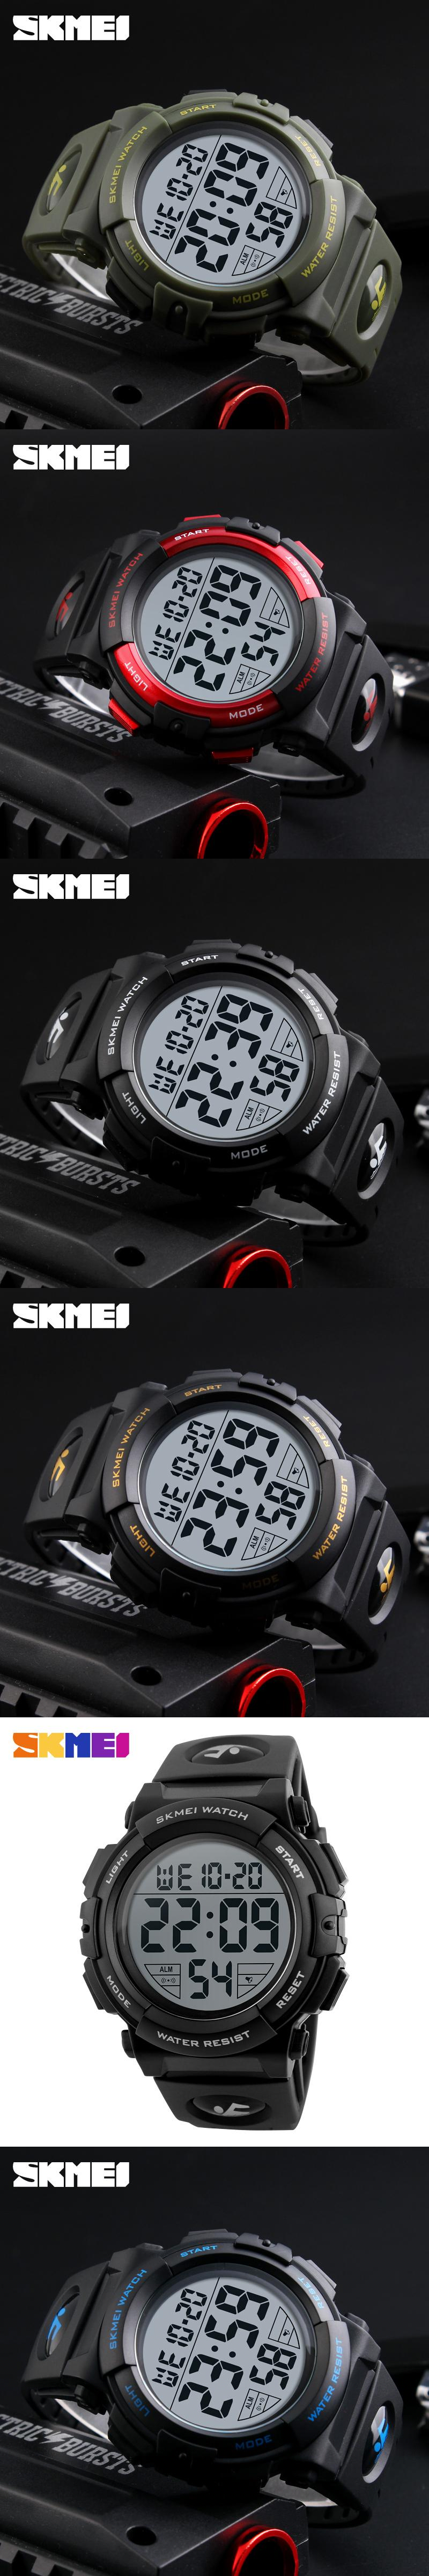 2595feb4b8c SKMEI 1258 MEN Digital Wristwatches 50M Waterproof Top Brand Luxury Shock  Resistant Chrono Complete Calender Relogio